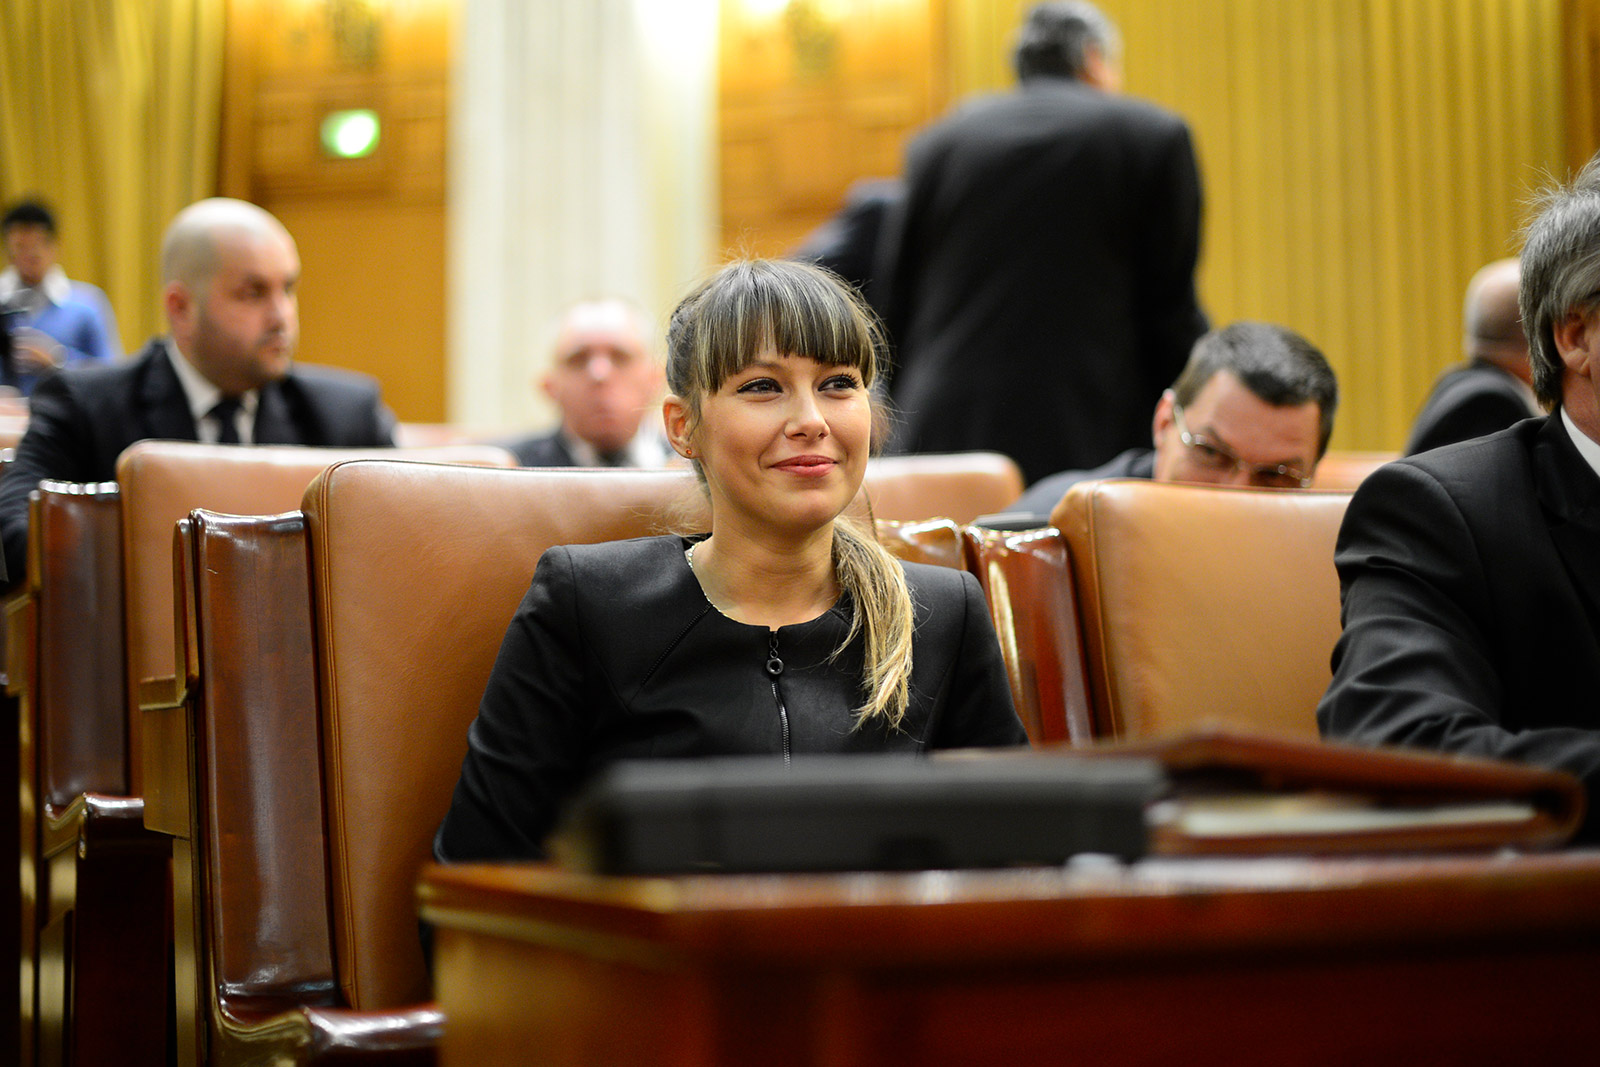 Cătălina Ștefănescu. Foto: Mediafax Foto, Octav Ganea